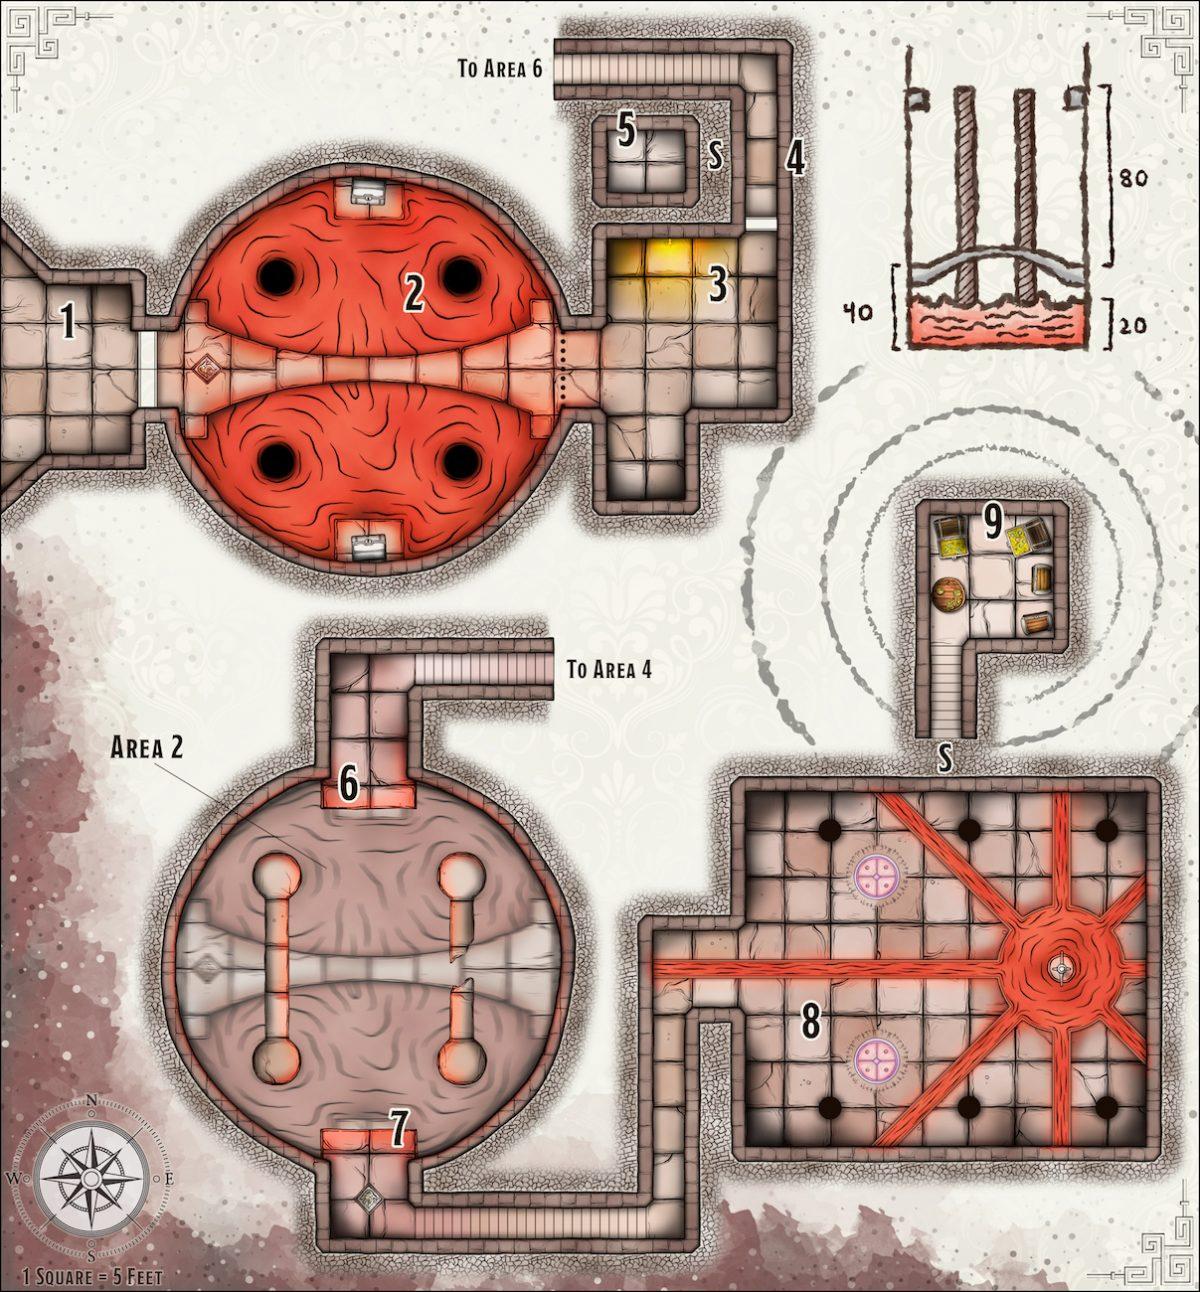 370 The Scarlet Vault